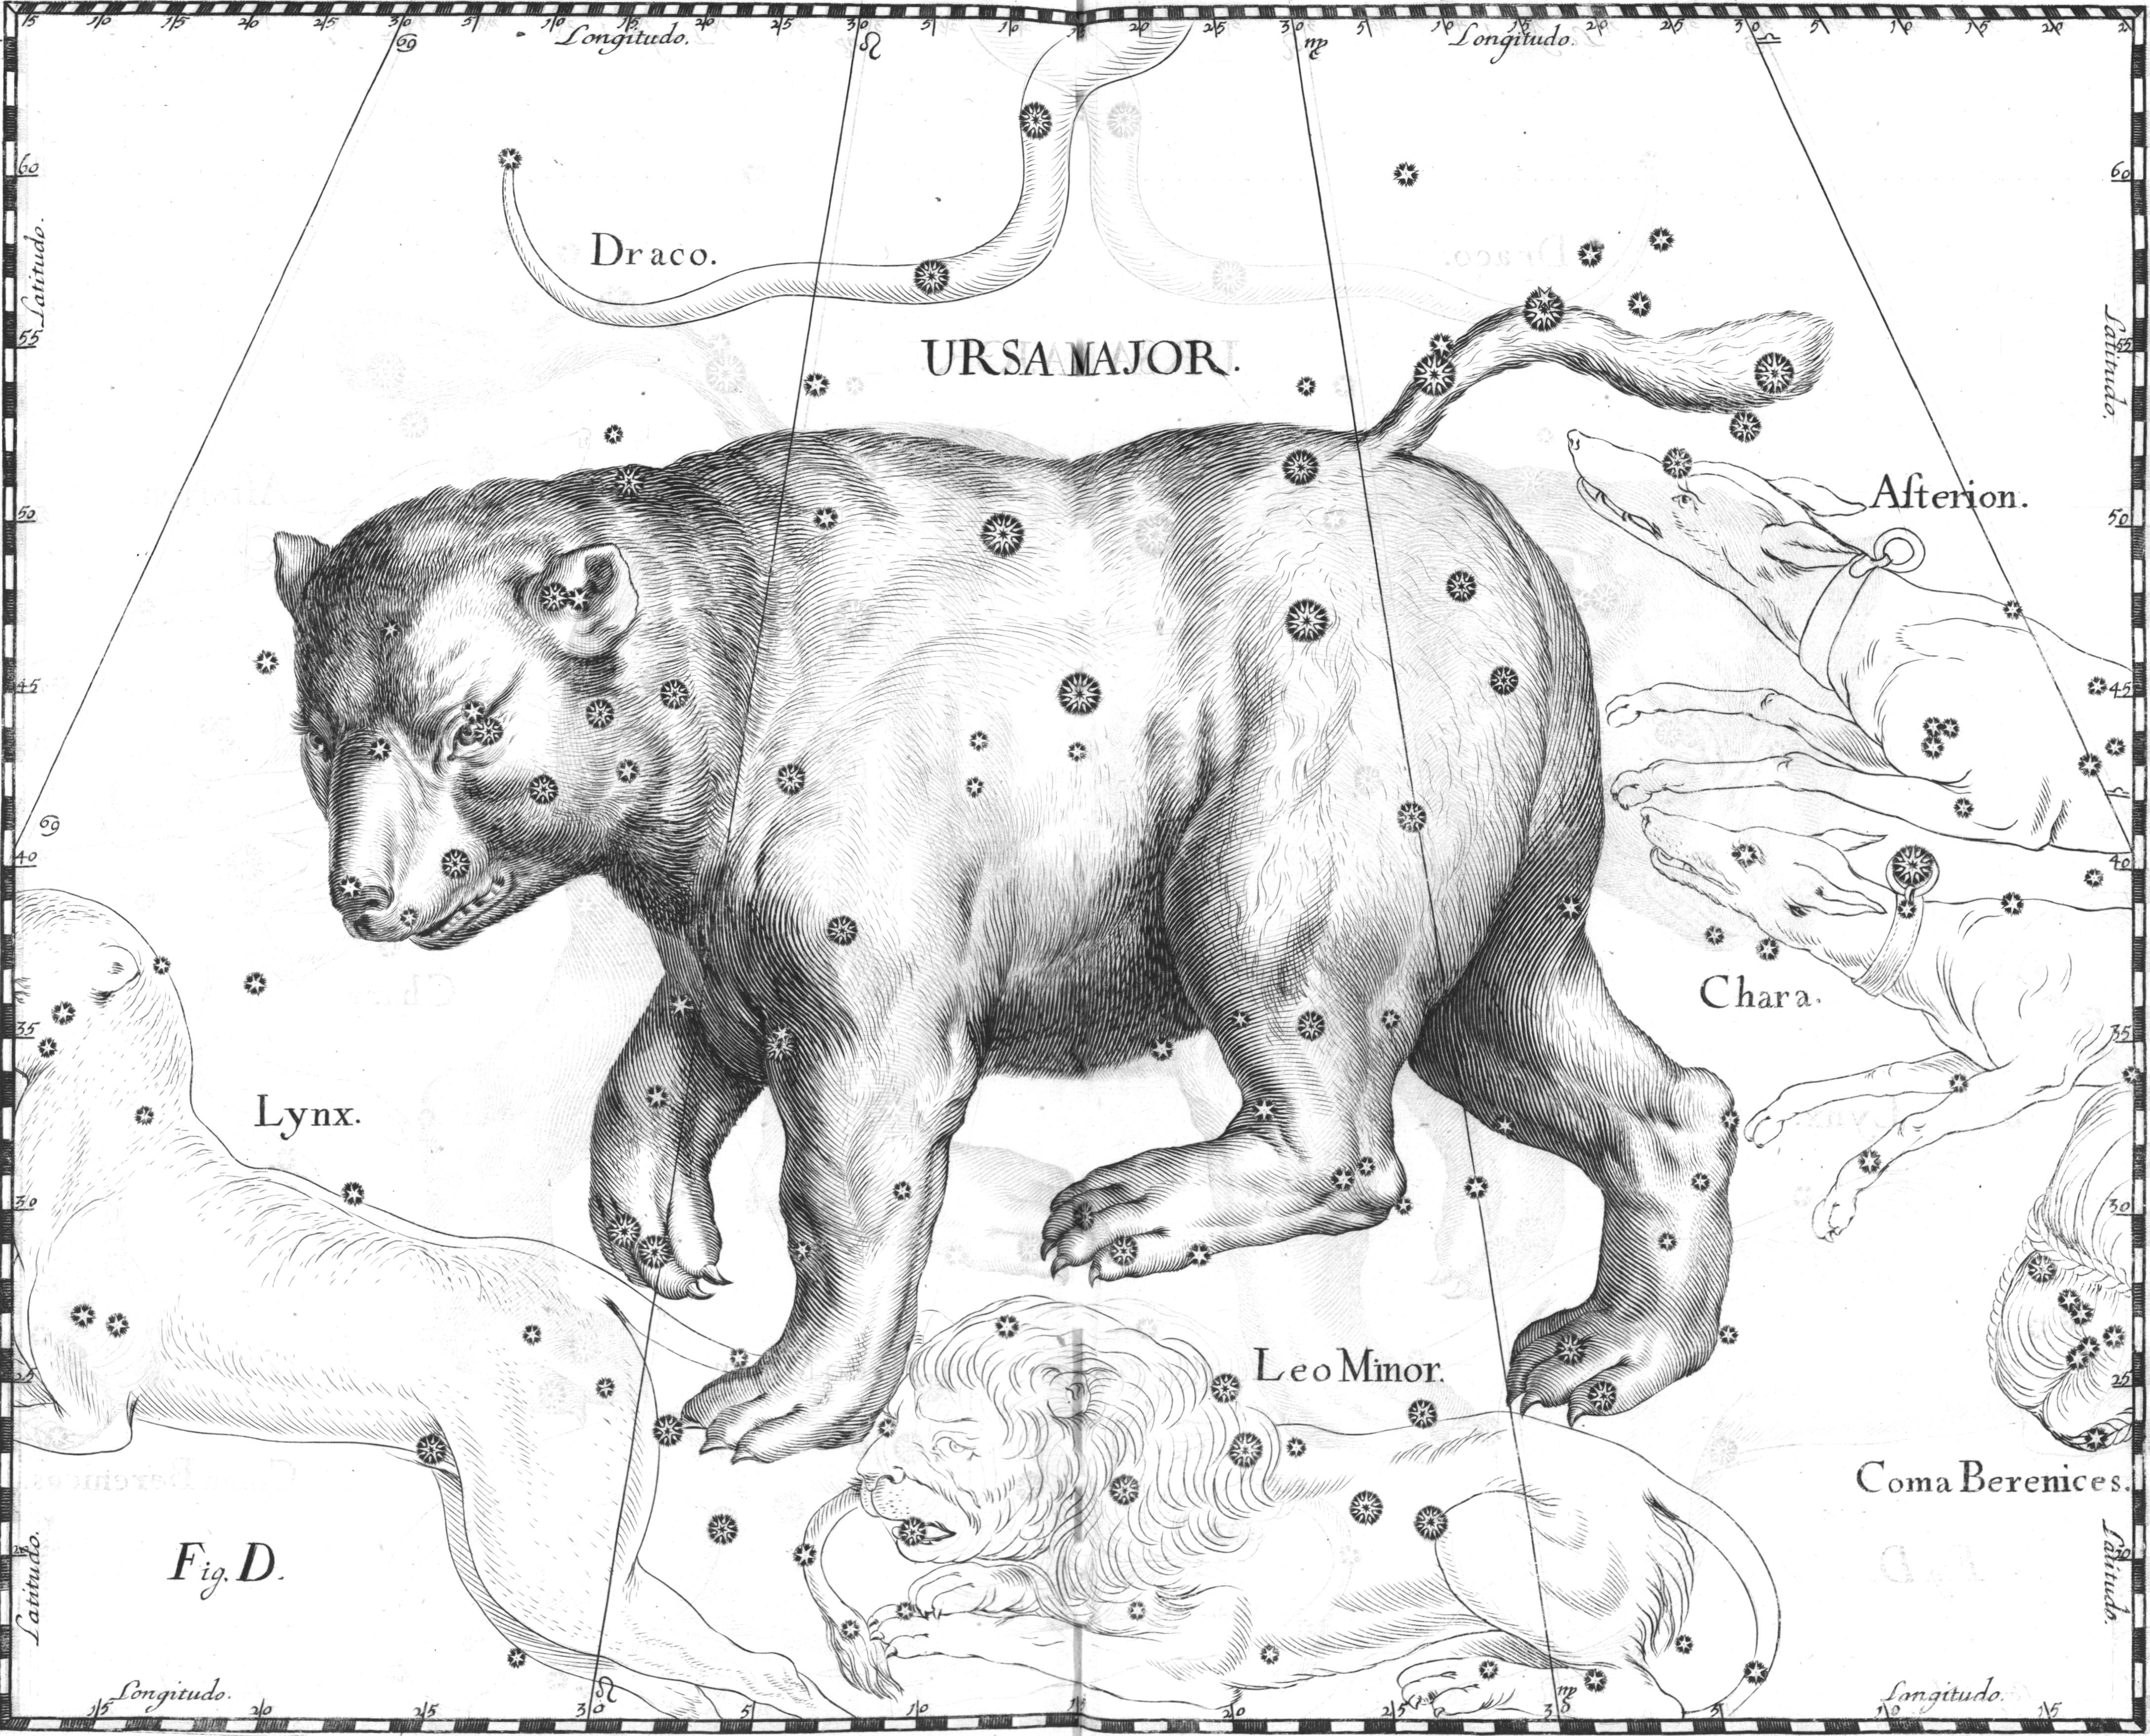 Ursa Major Drawing Made of Ursa Major